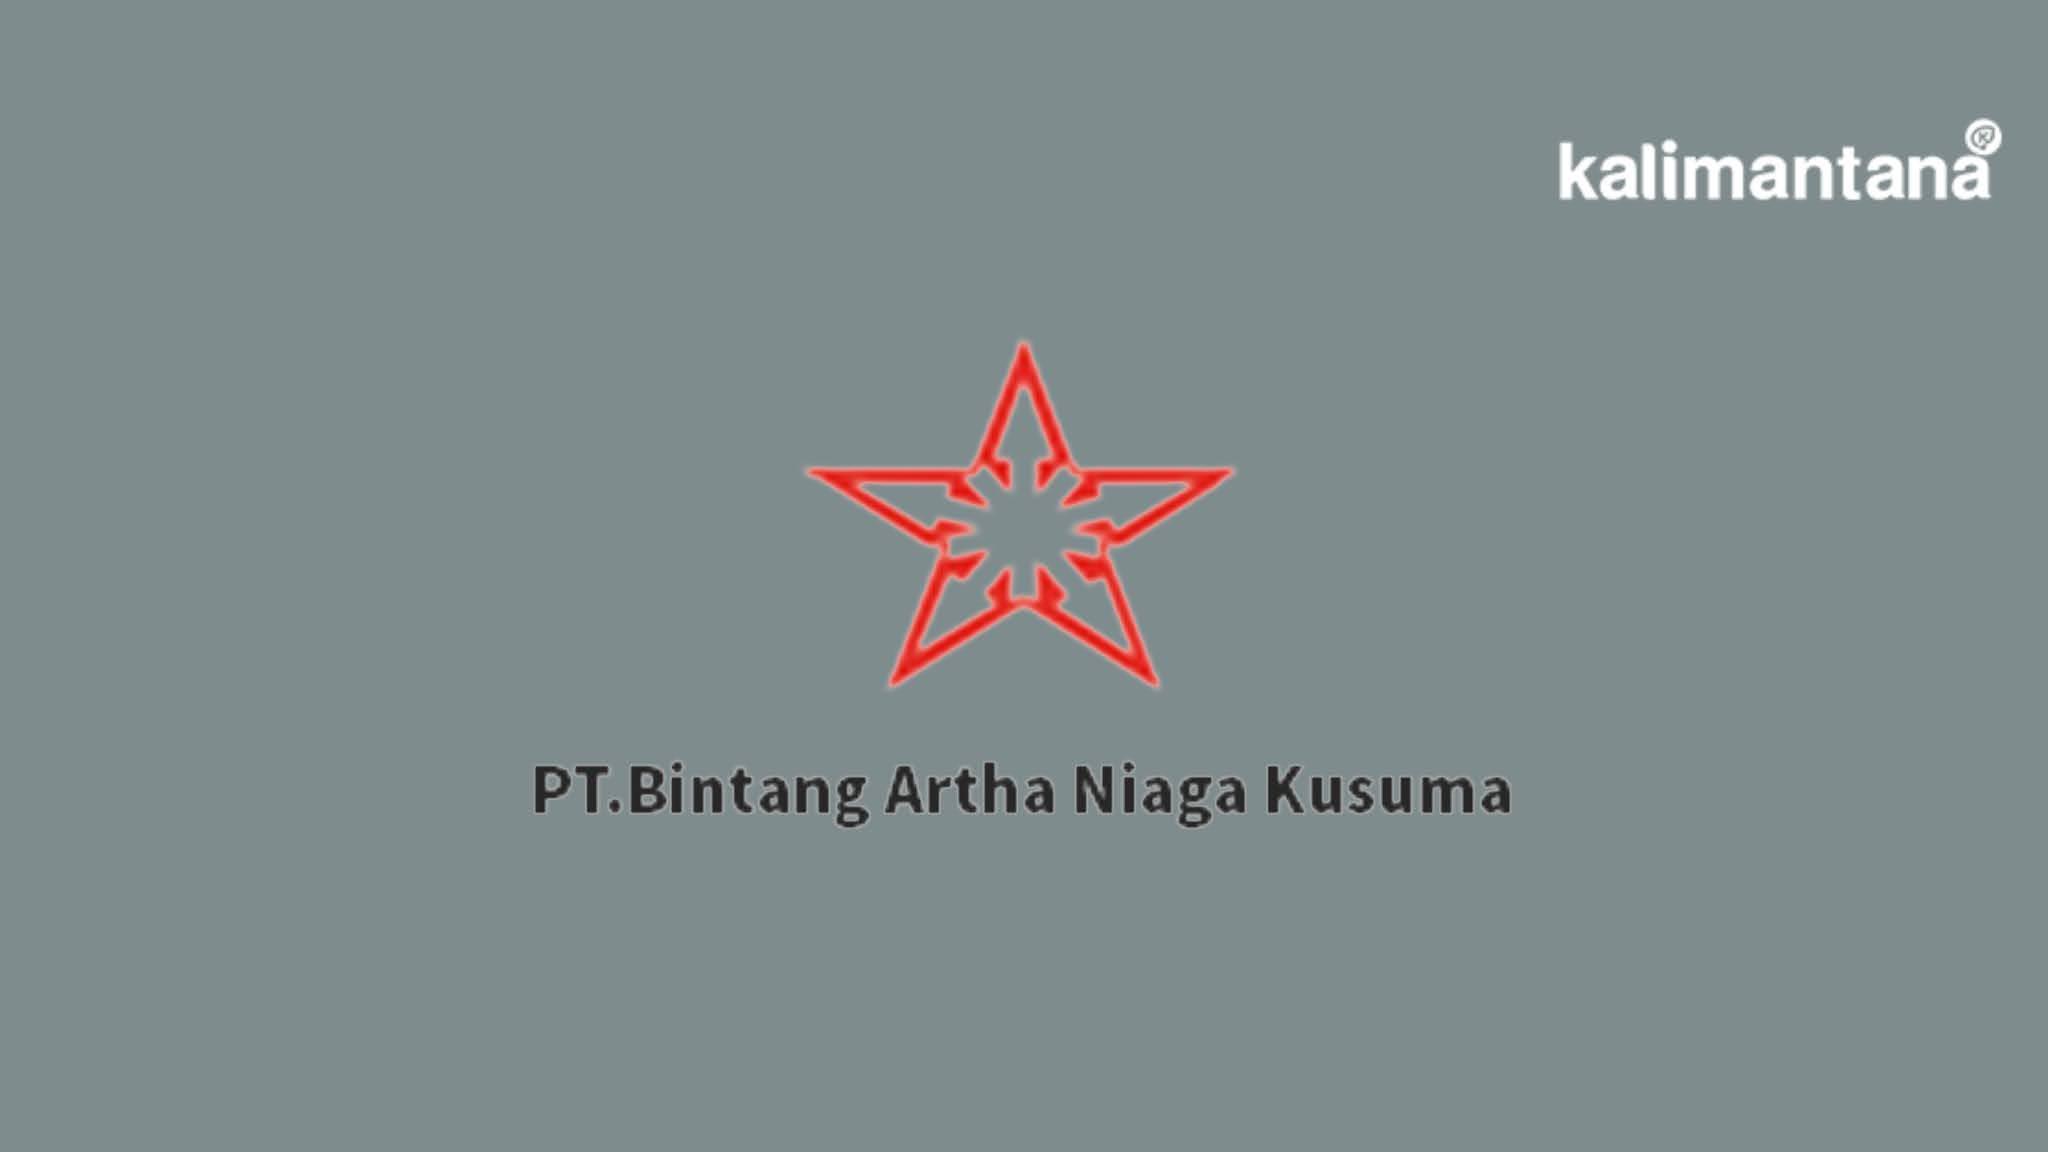 Bintang Artha Niaga Kusuma